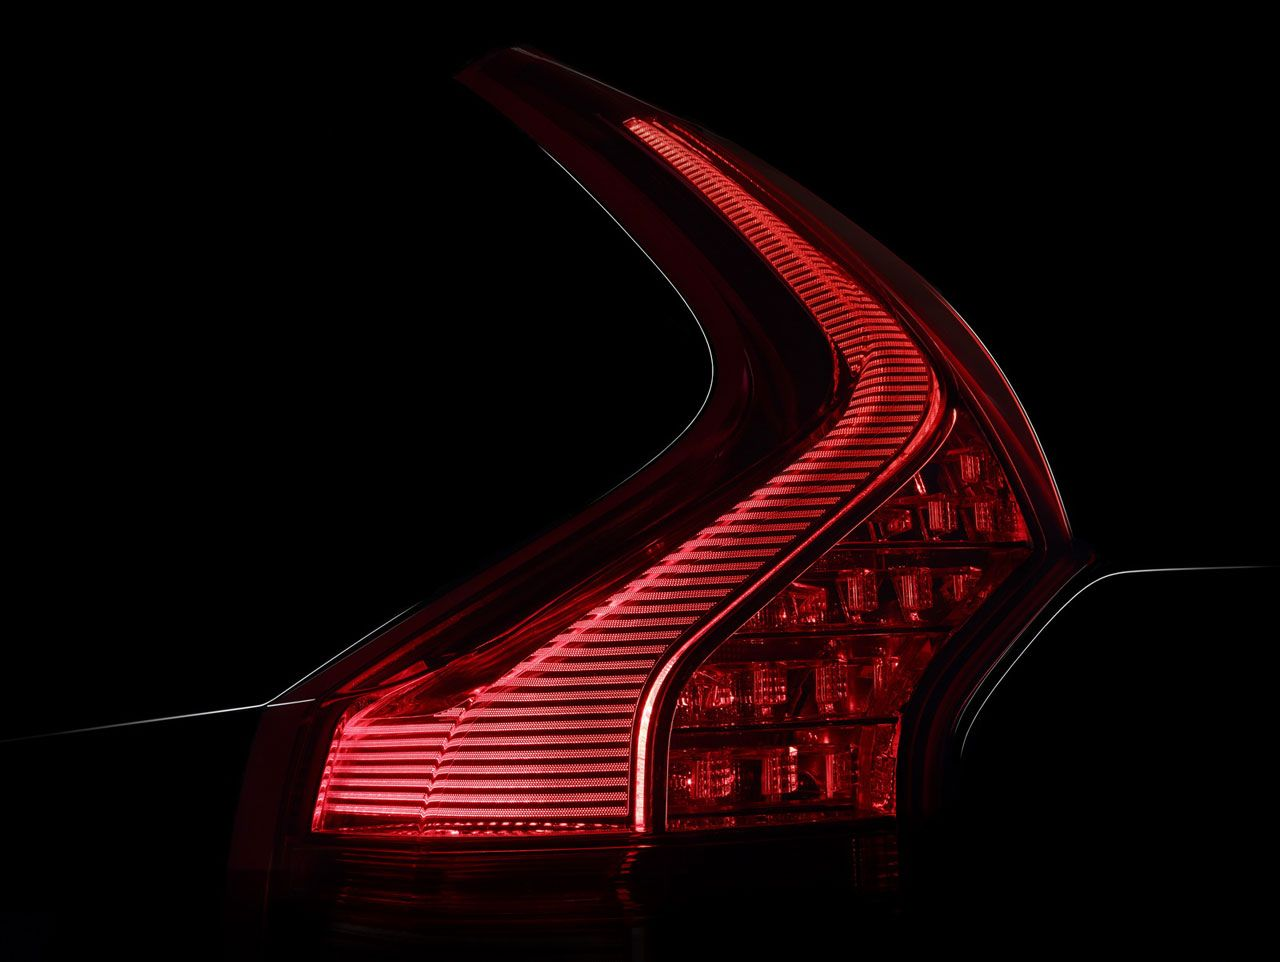 Volvo Xc90 Tail Light Design Detail Car Body Design Volvo Xc90 Volvo Car Headlights